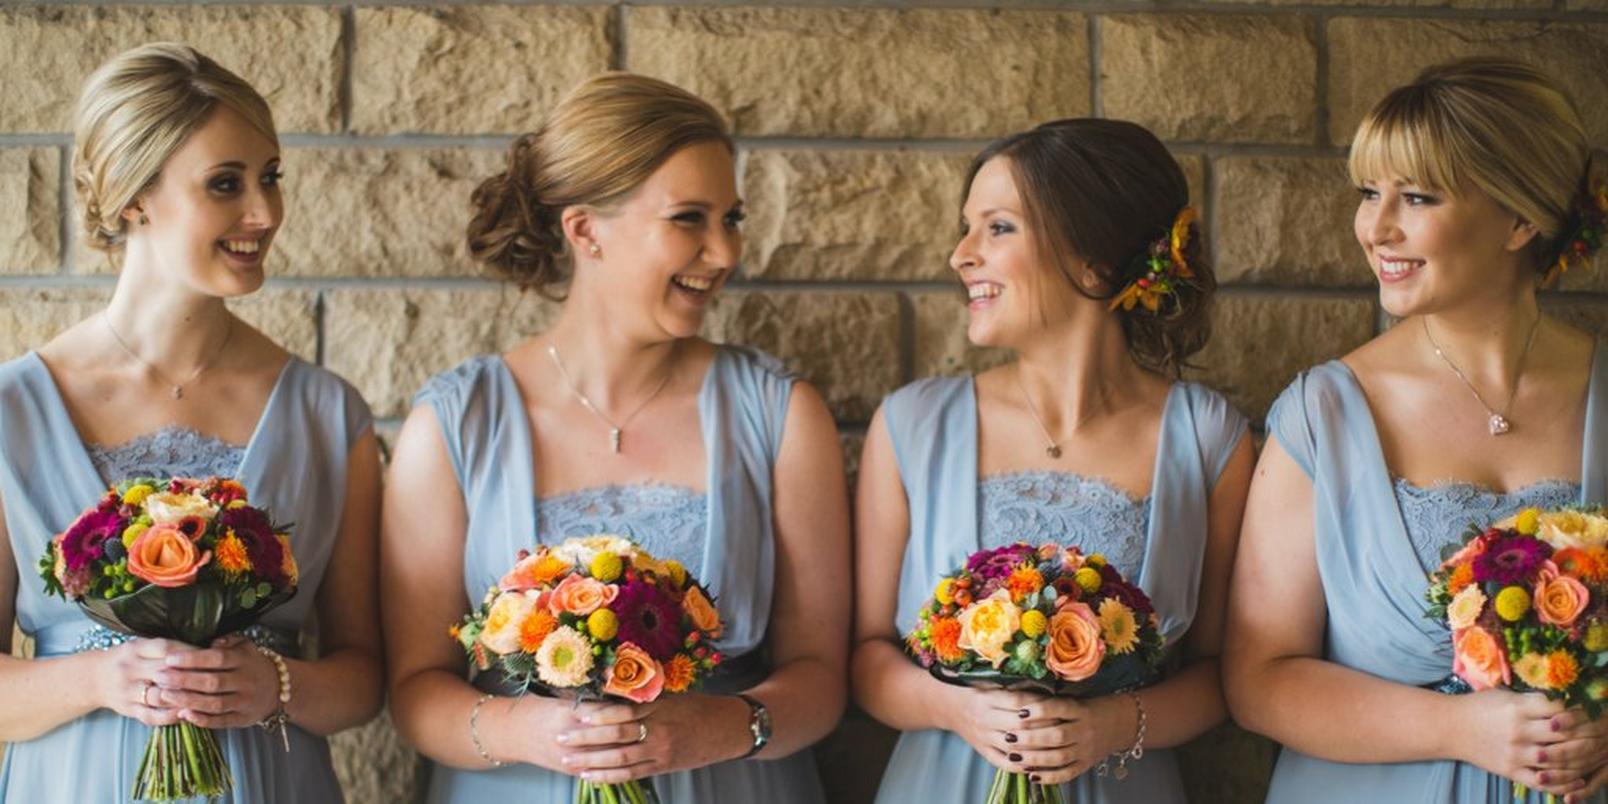 8-beautiful-bridesmaid-bouquets-8